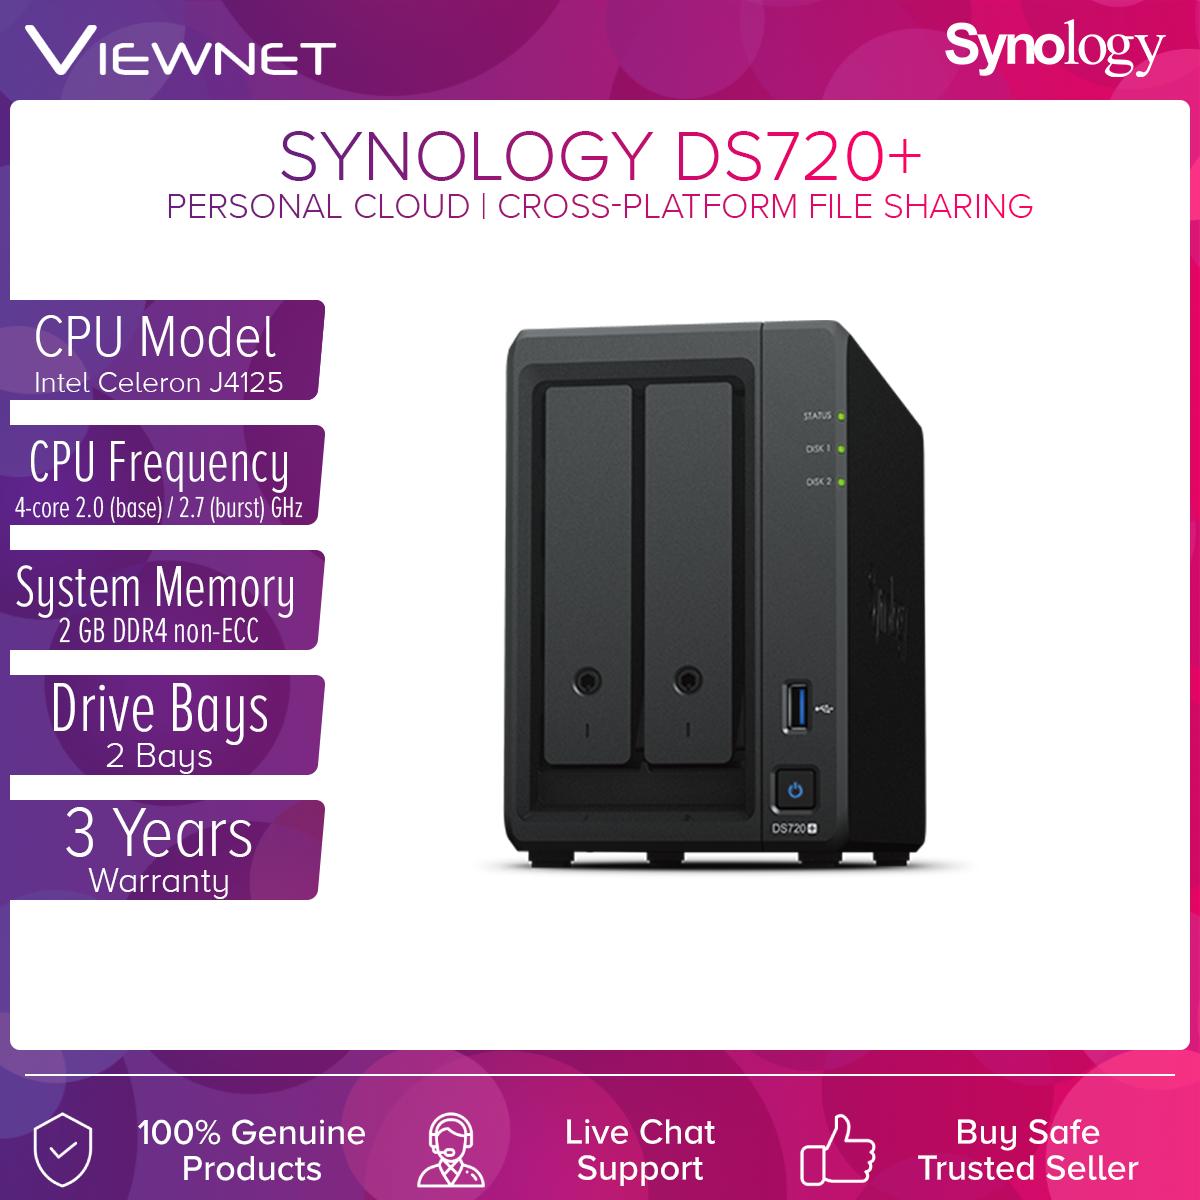 Synology DS720+ NAS DiskStation 2-Bays NAS Quad-Core Processor Data Backup Storage External Hard Drive